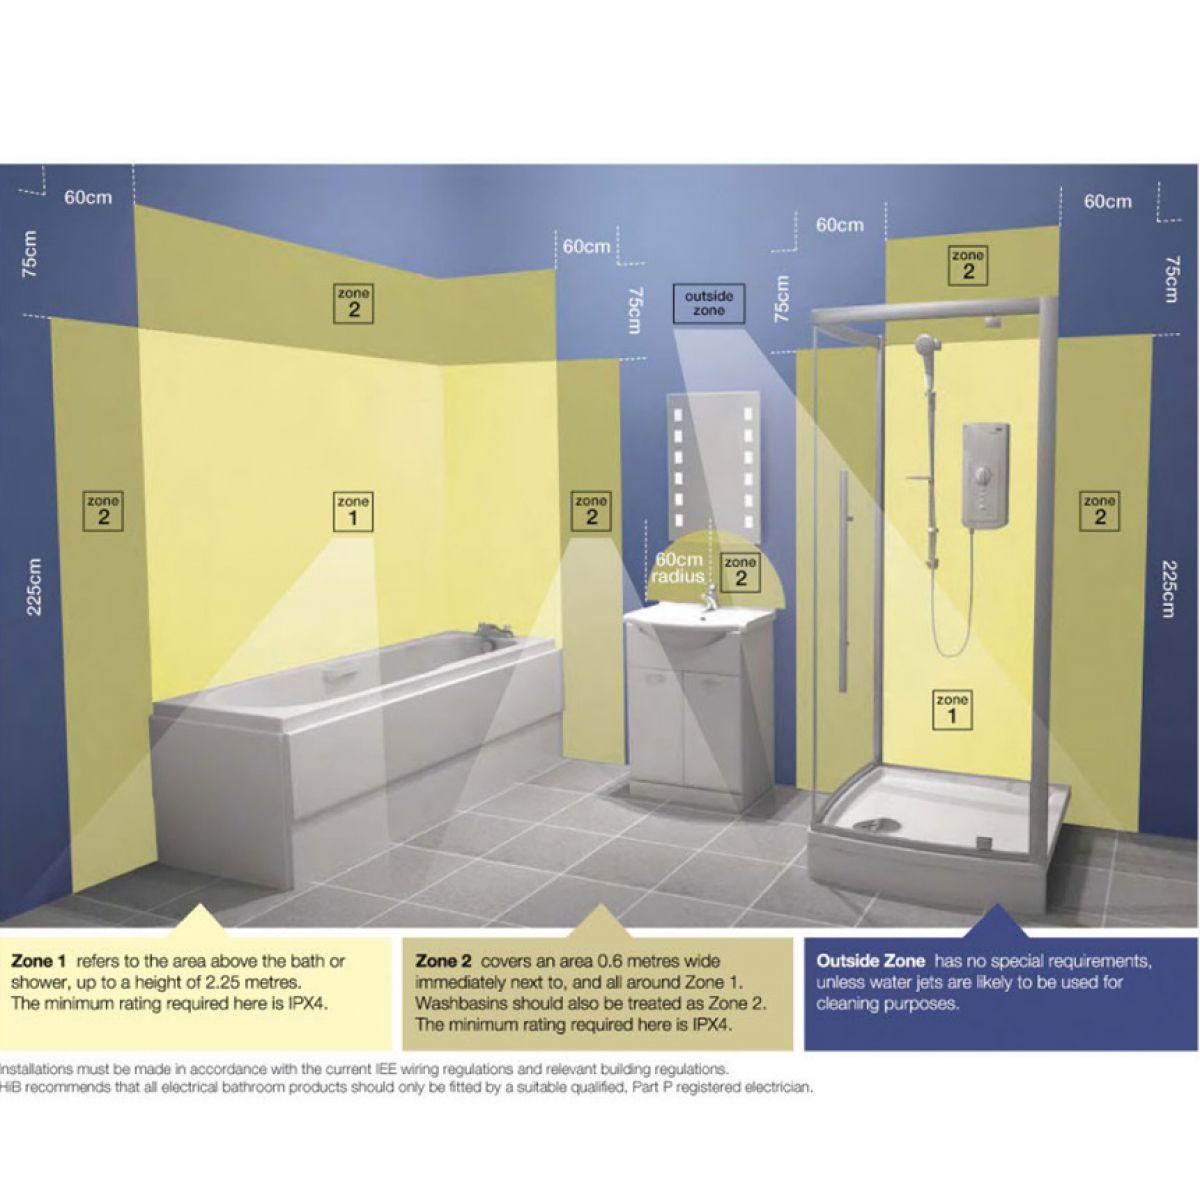 Hib Bathroom Lights Bathroom Lighting Hib Captivating  sc 1 st  Interior Design & Bathroom Zones Lighting - Interior Design azcodes.com